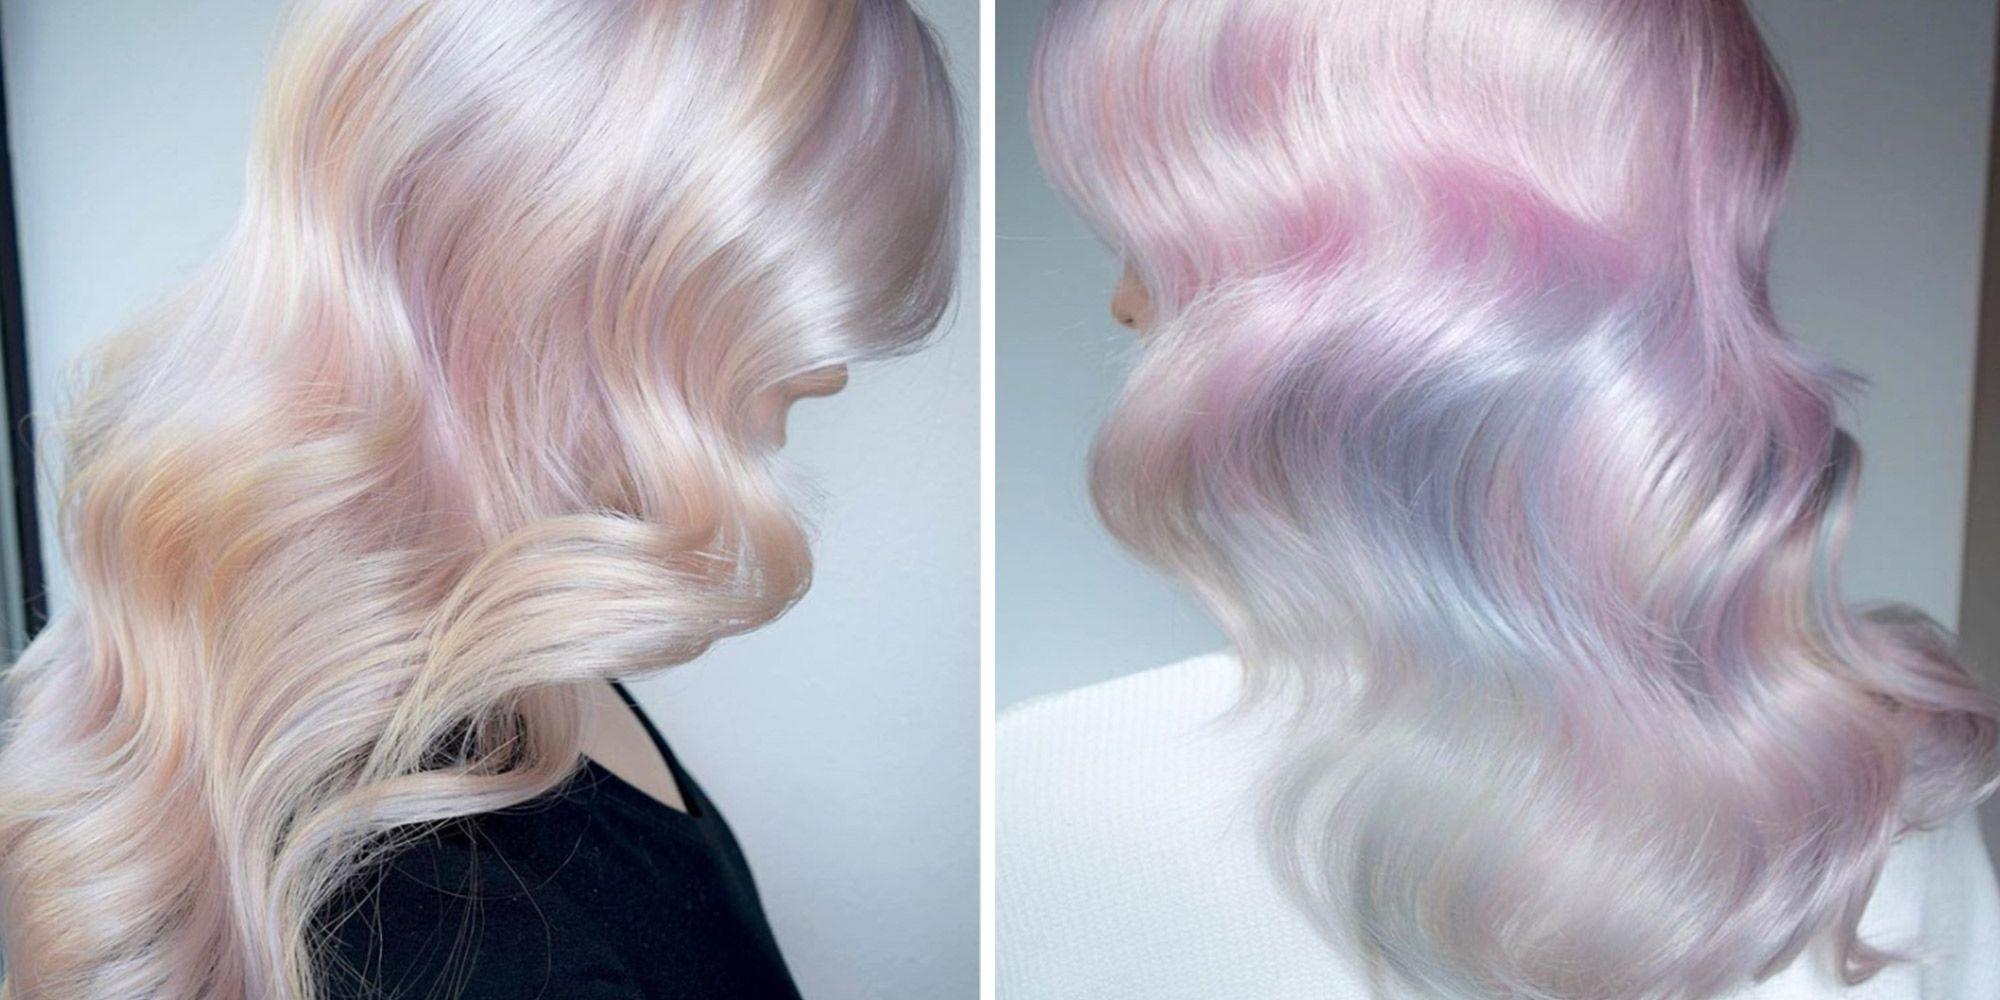 opal hair instagram's newest